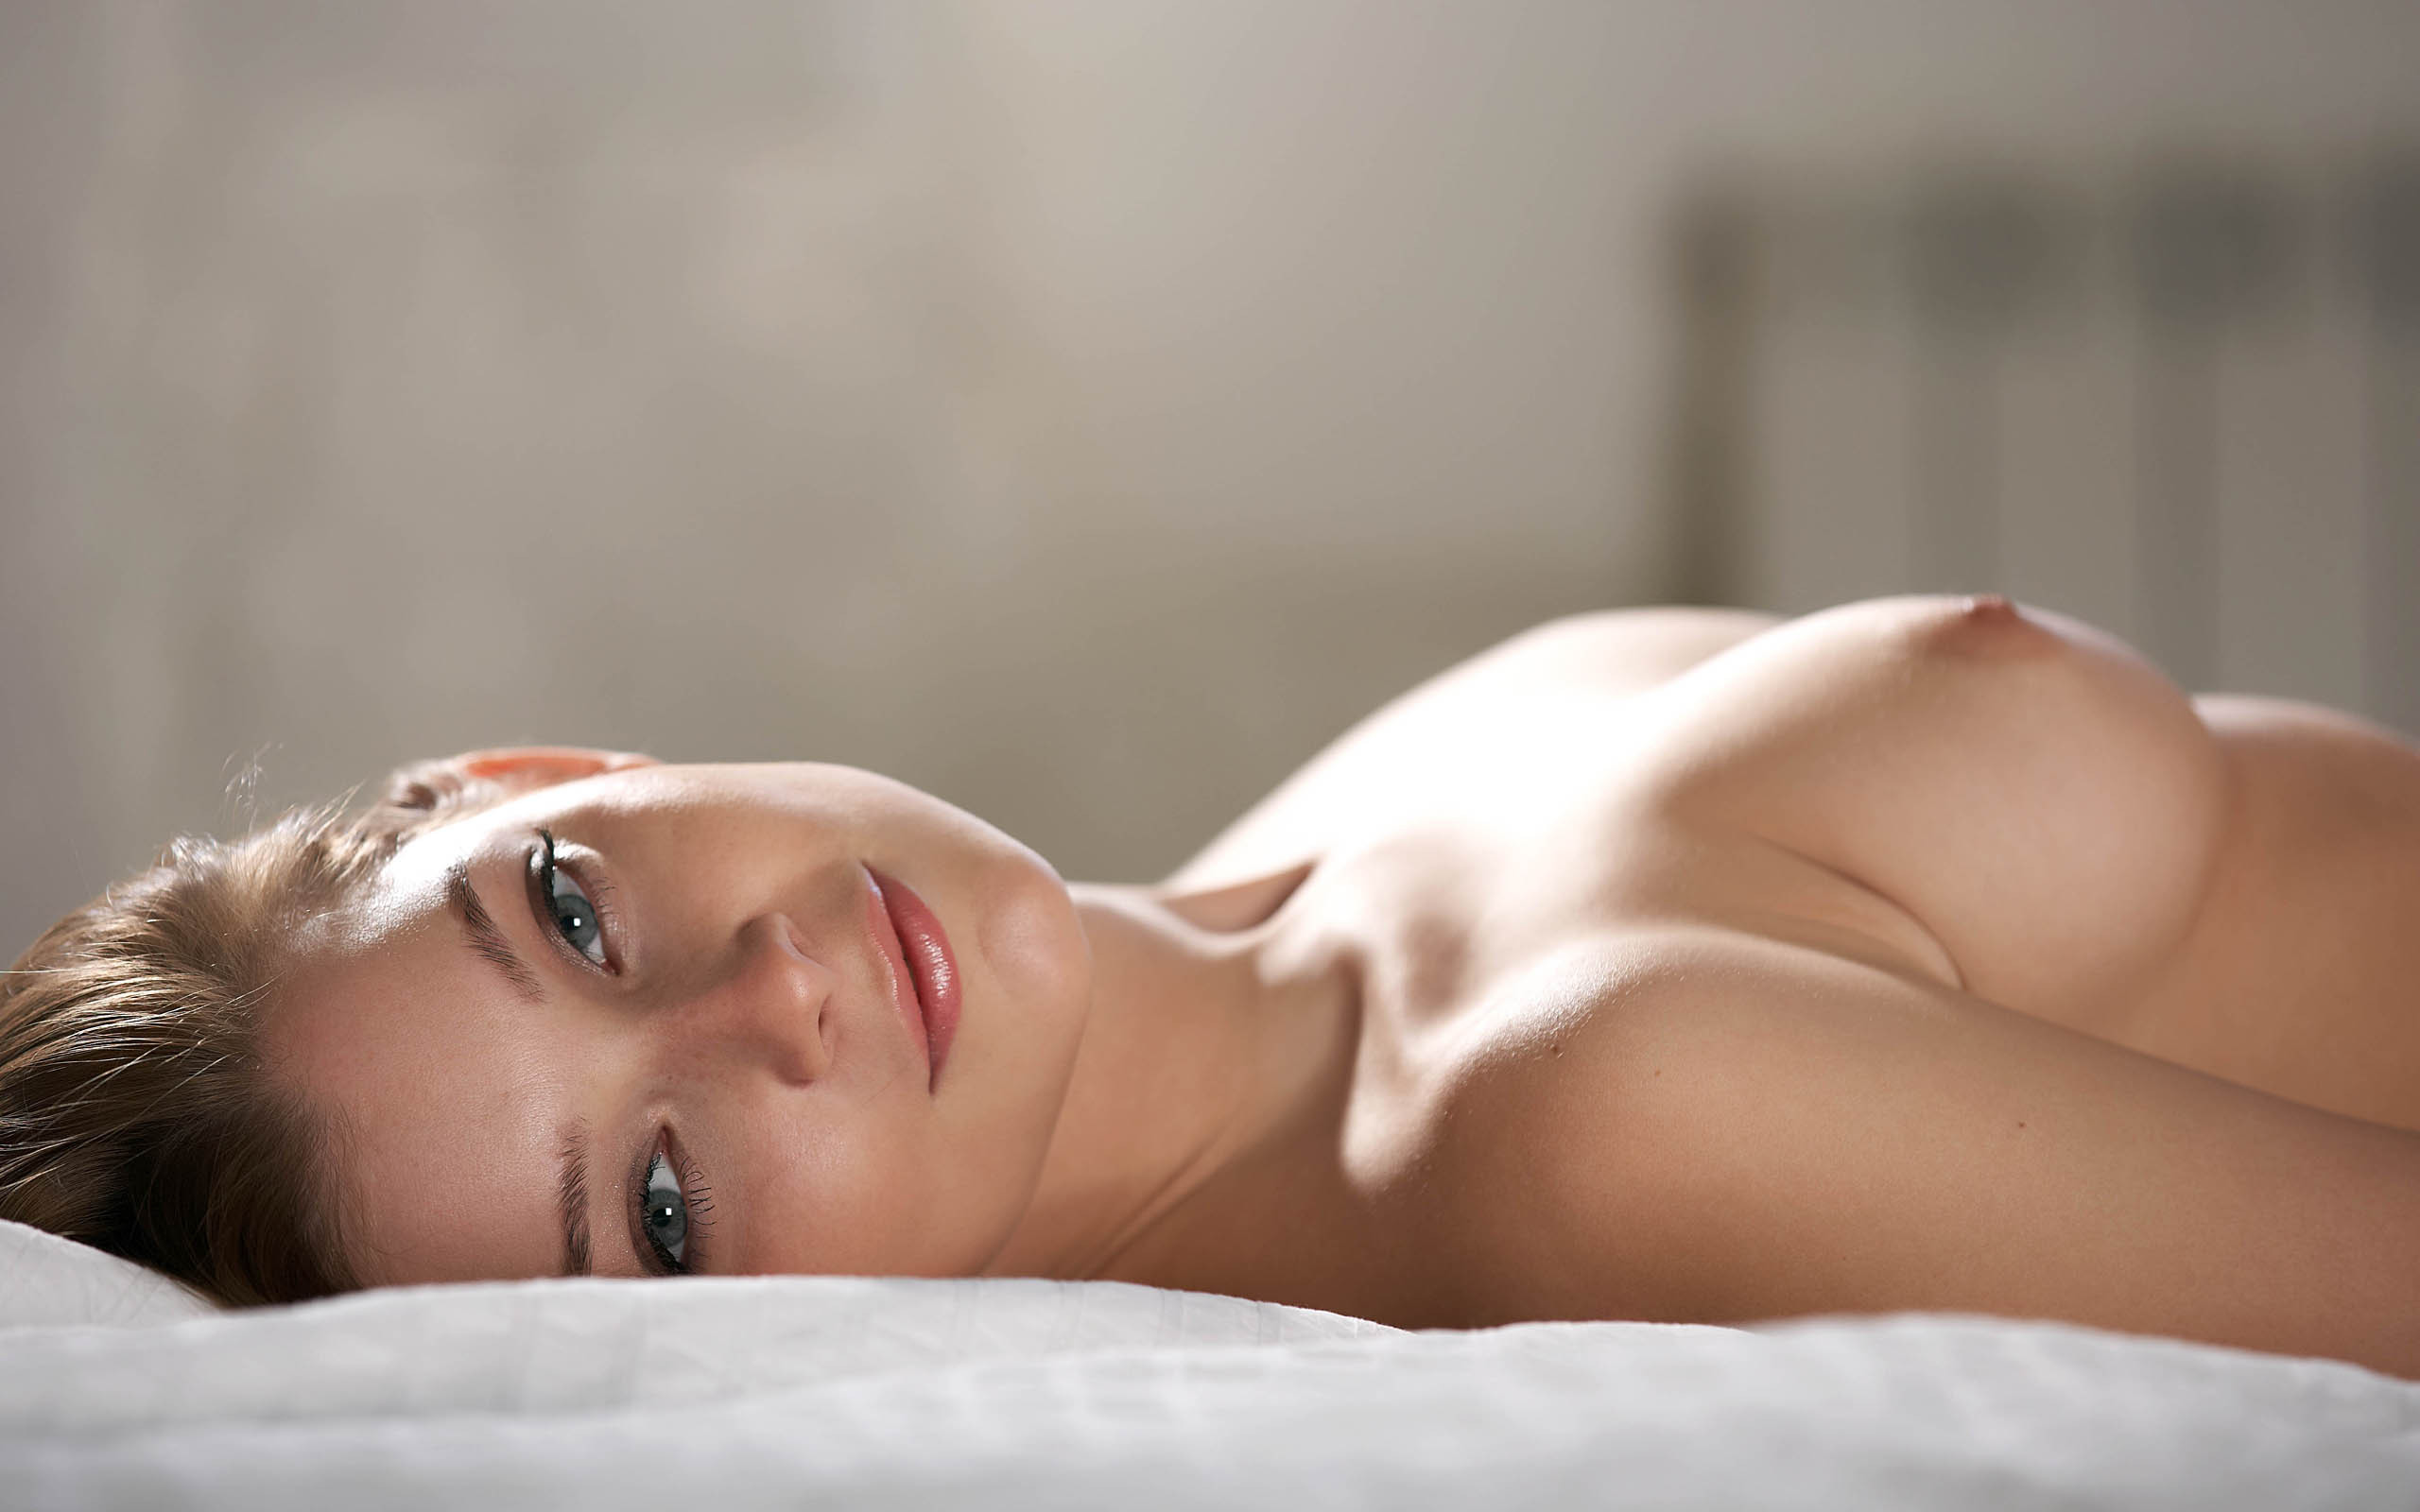 sex leketøy erotic wallpapers